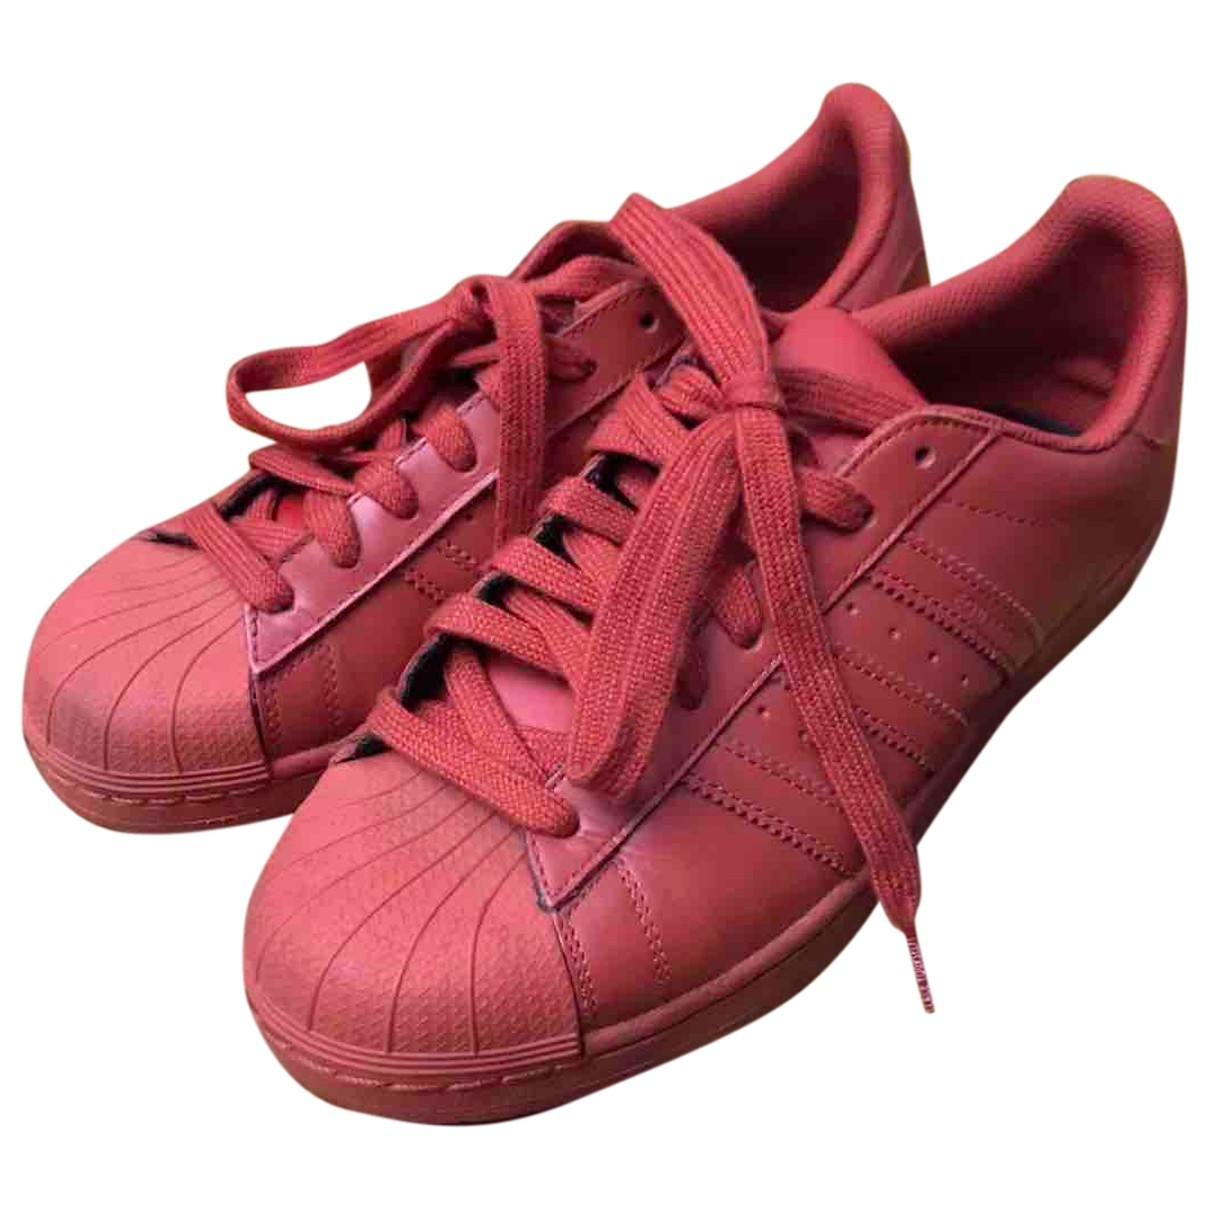 Deportivas Adidas X Pharrell Williams